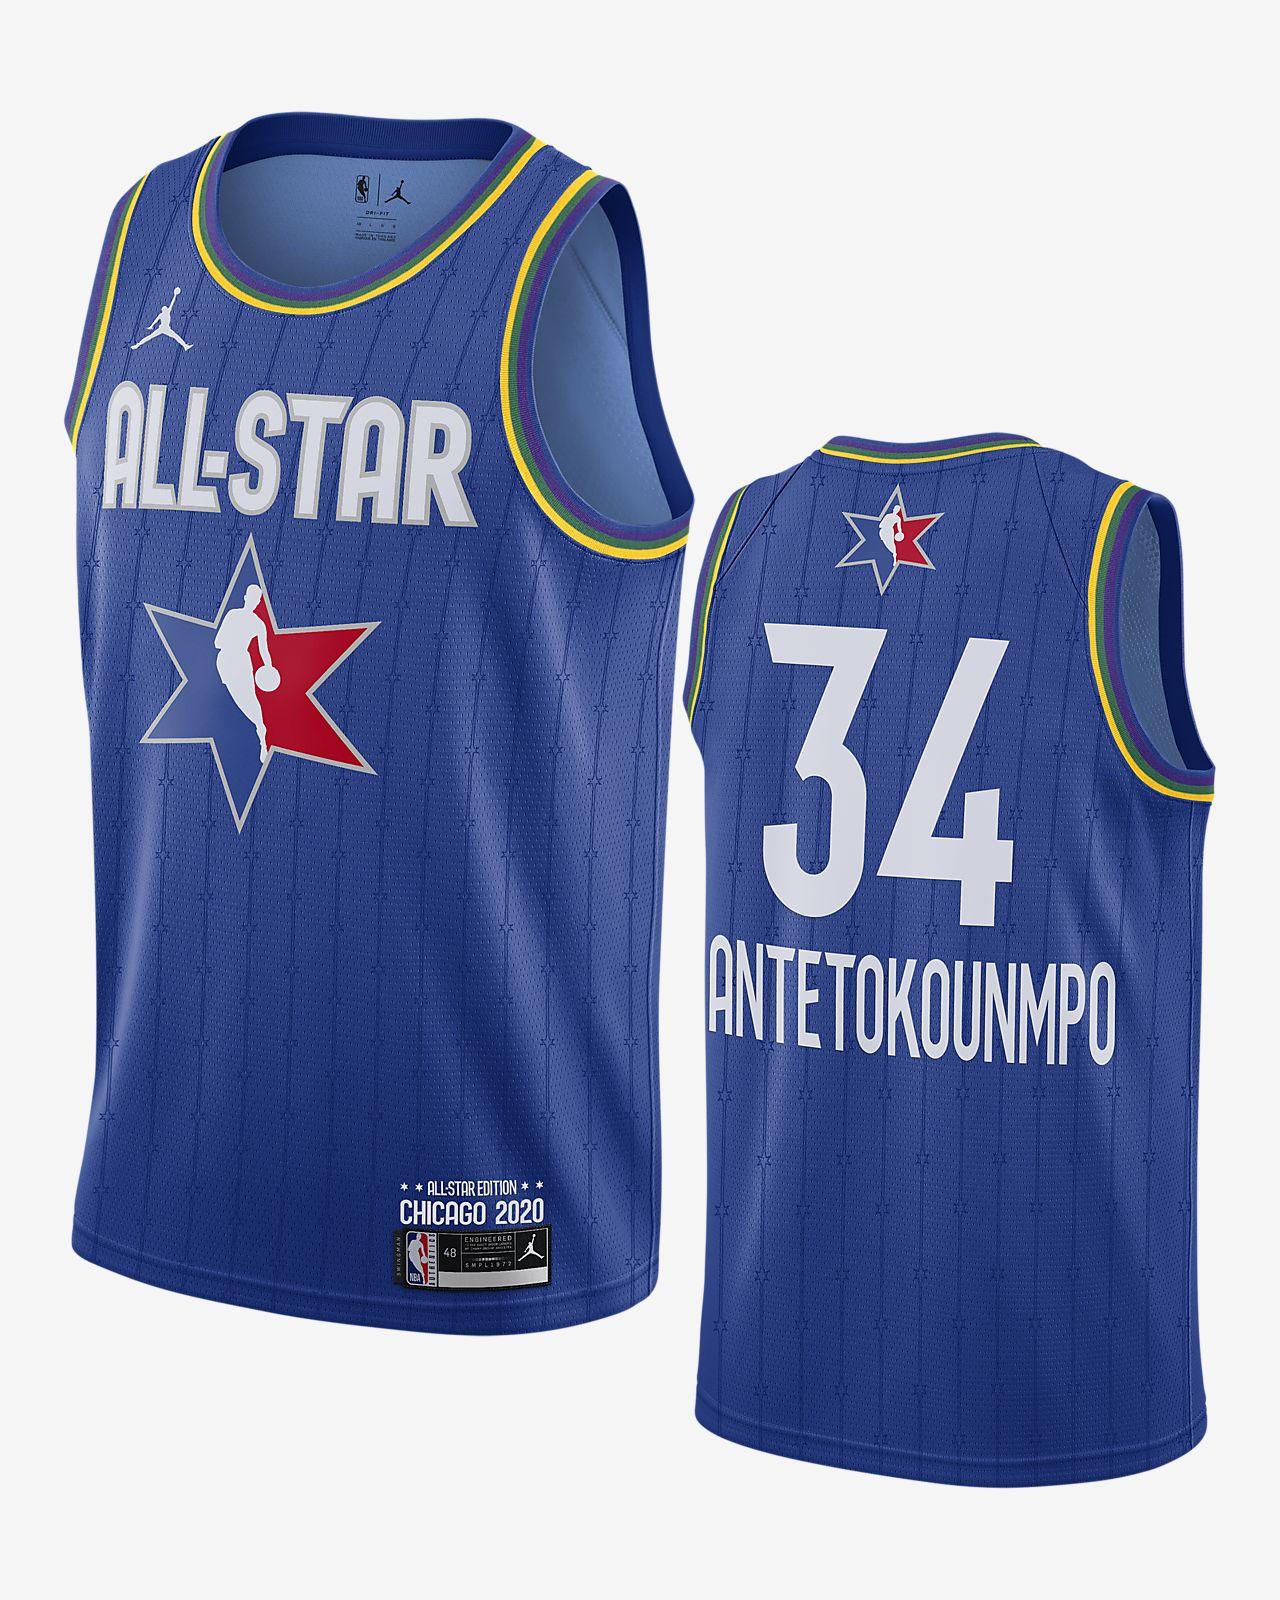 Maillot Jordan NBA Swingman Giannis Antetokounmpo All Star